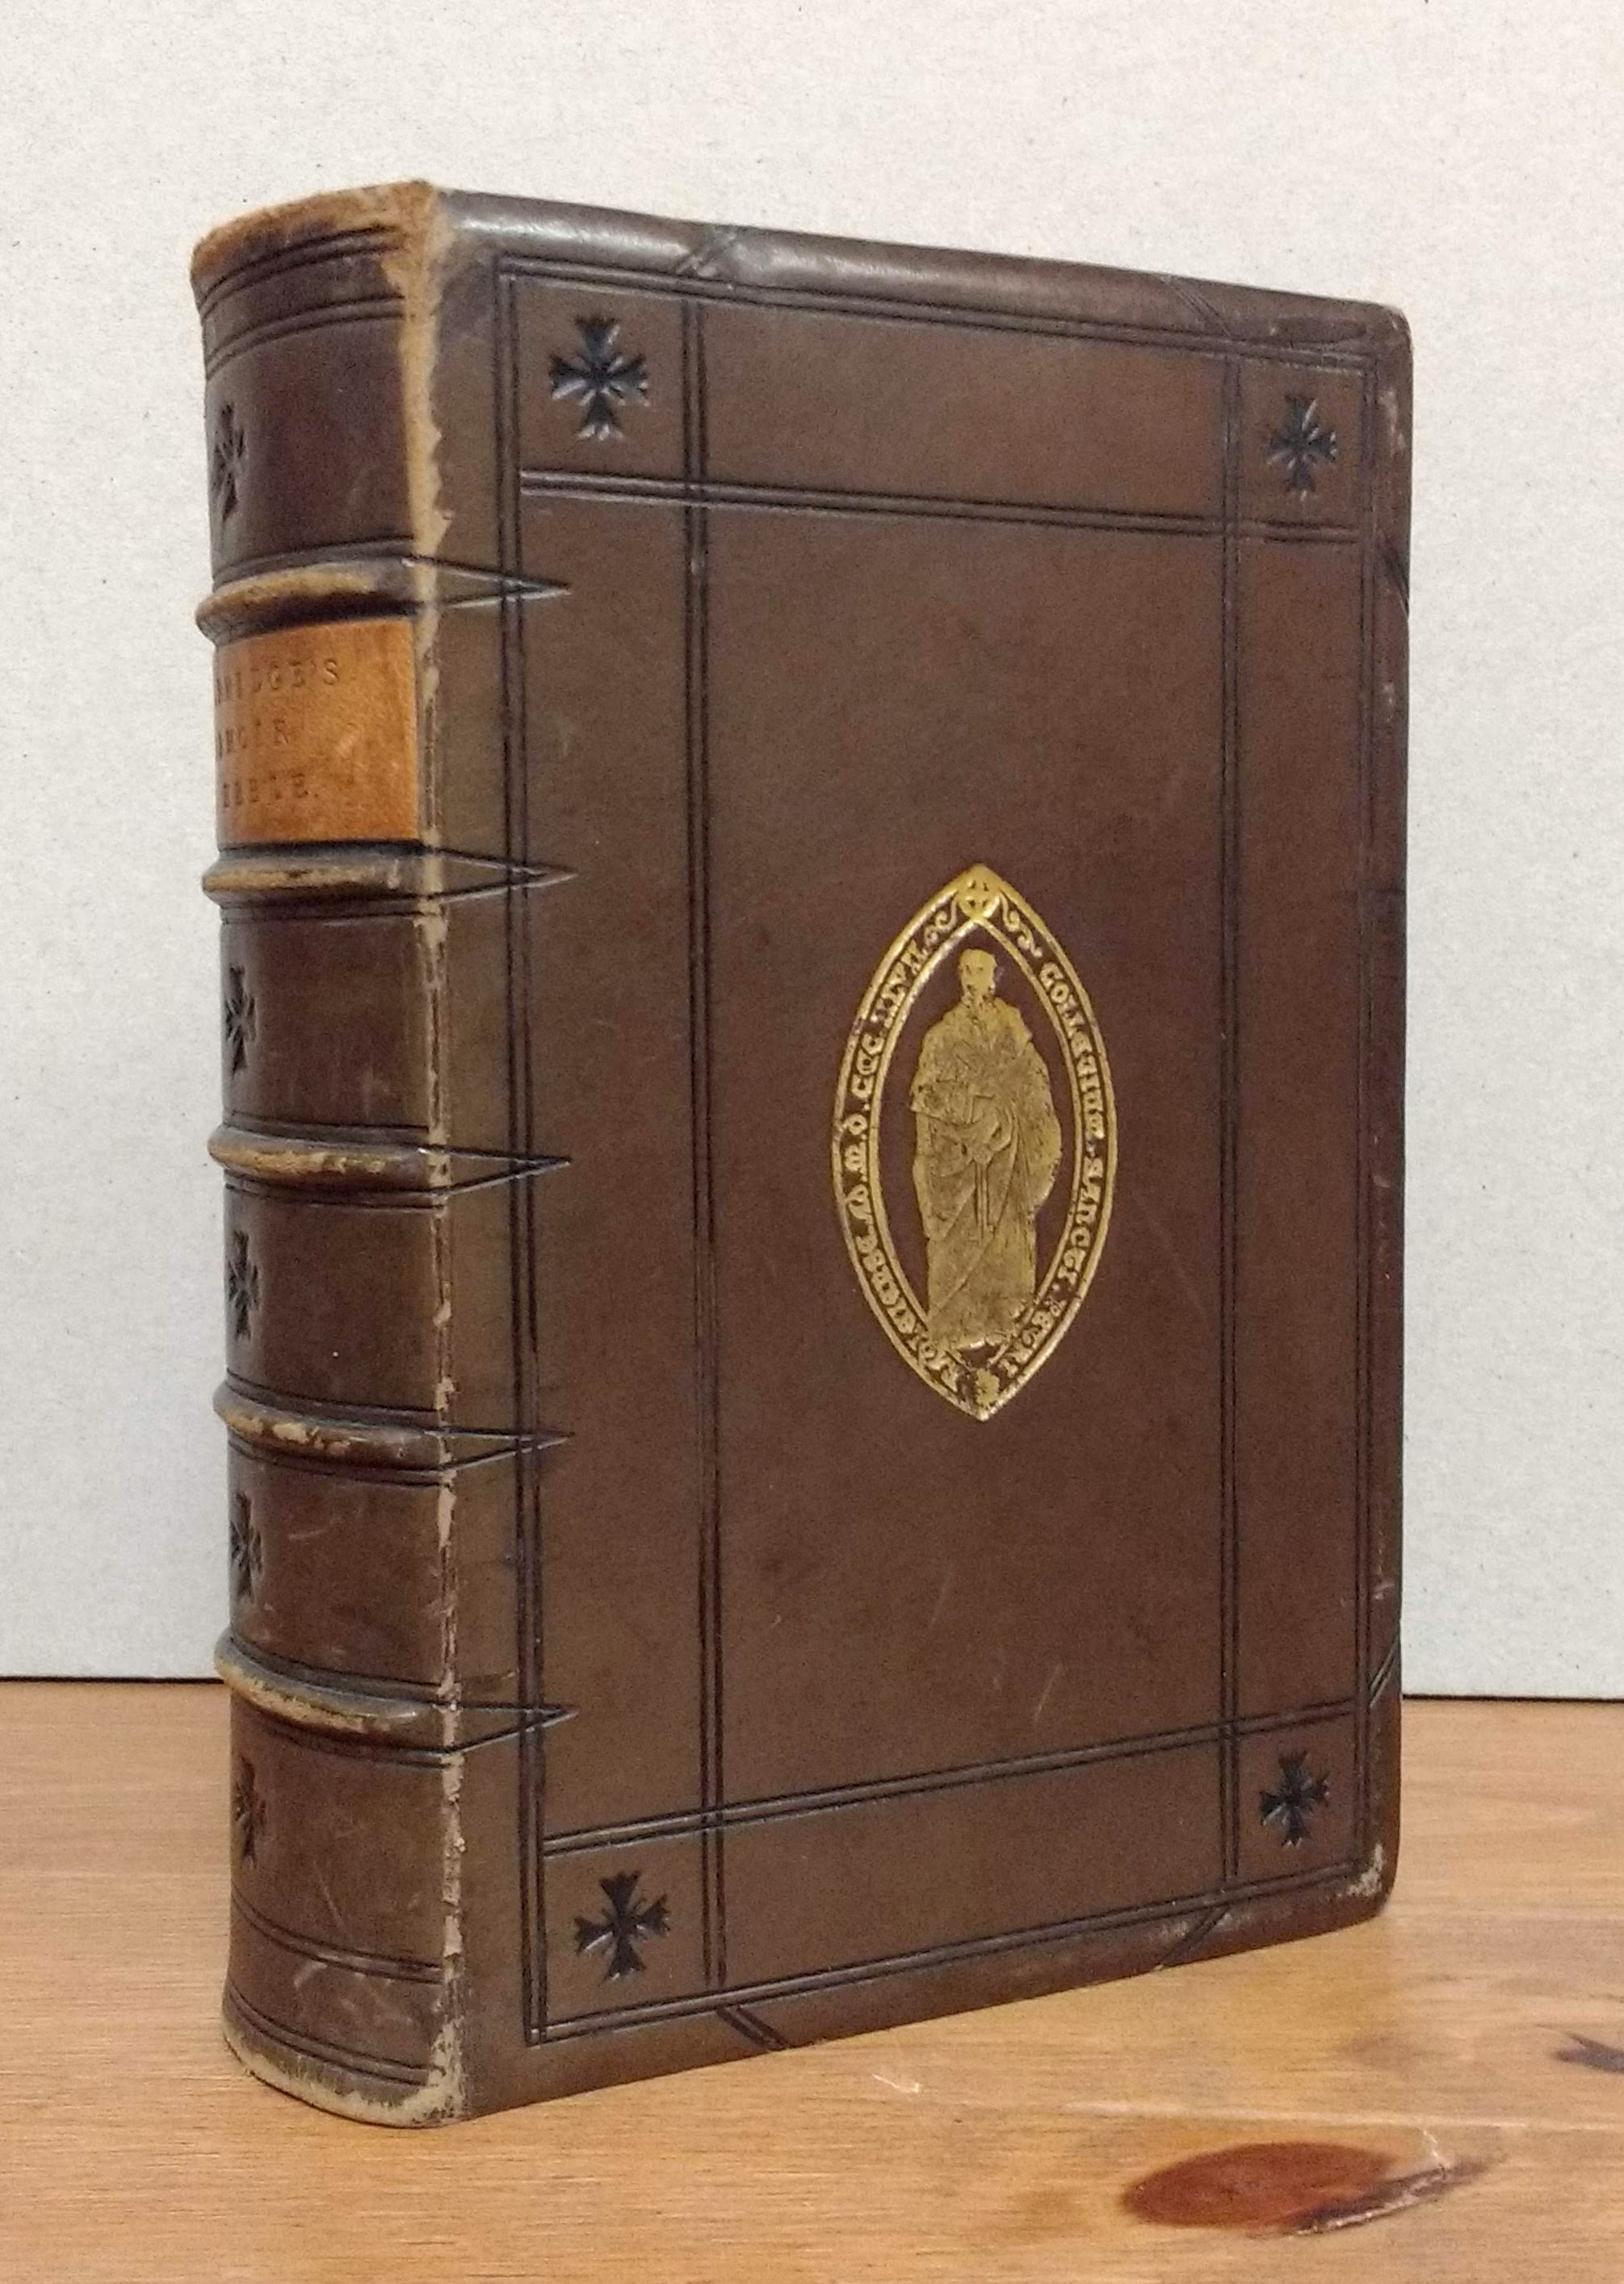 A Memoir of the Rev. John Kebele, M.A. Late Vicar of Hursley, (Keble, Rev. John) Coleridge, J.T.